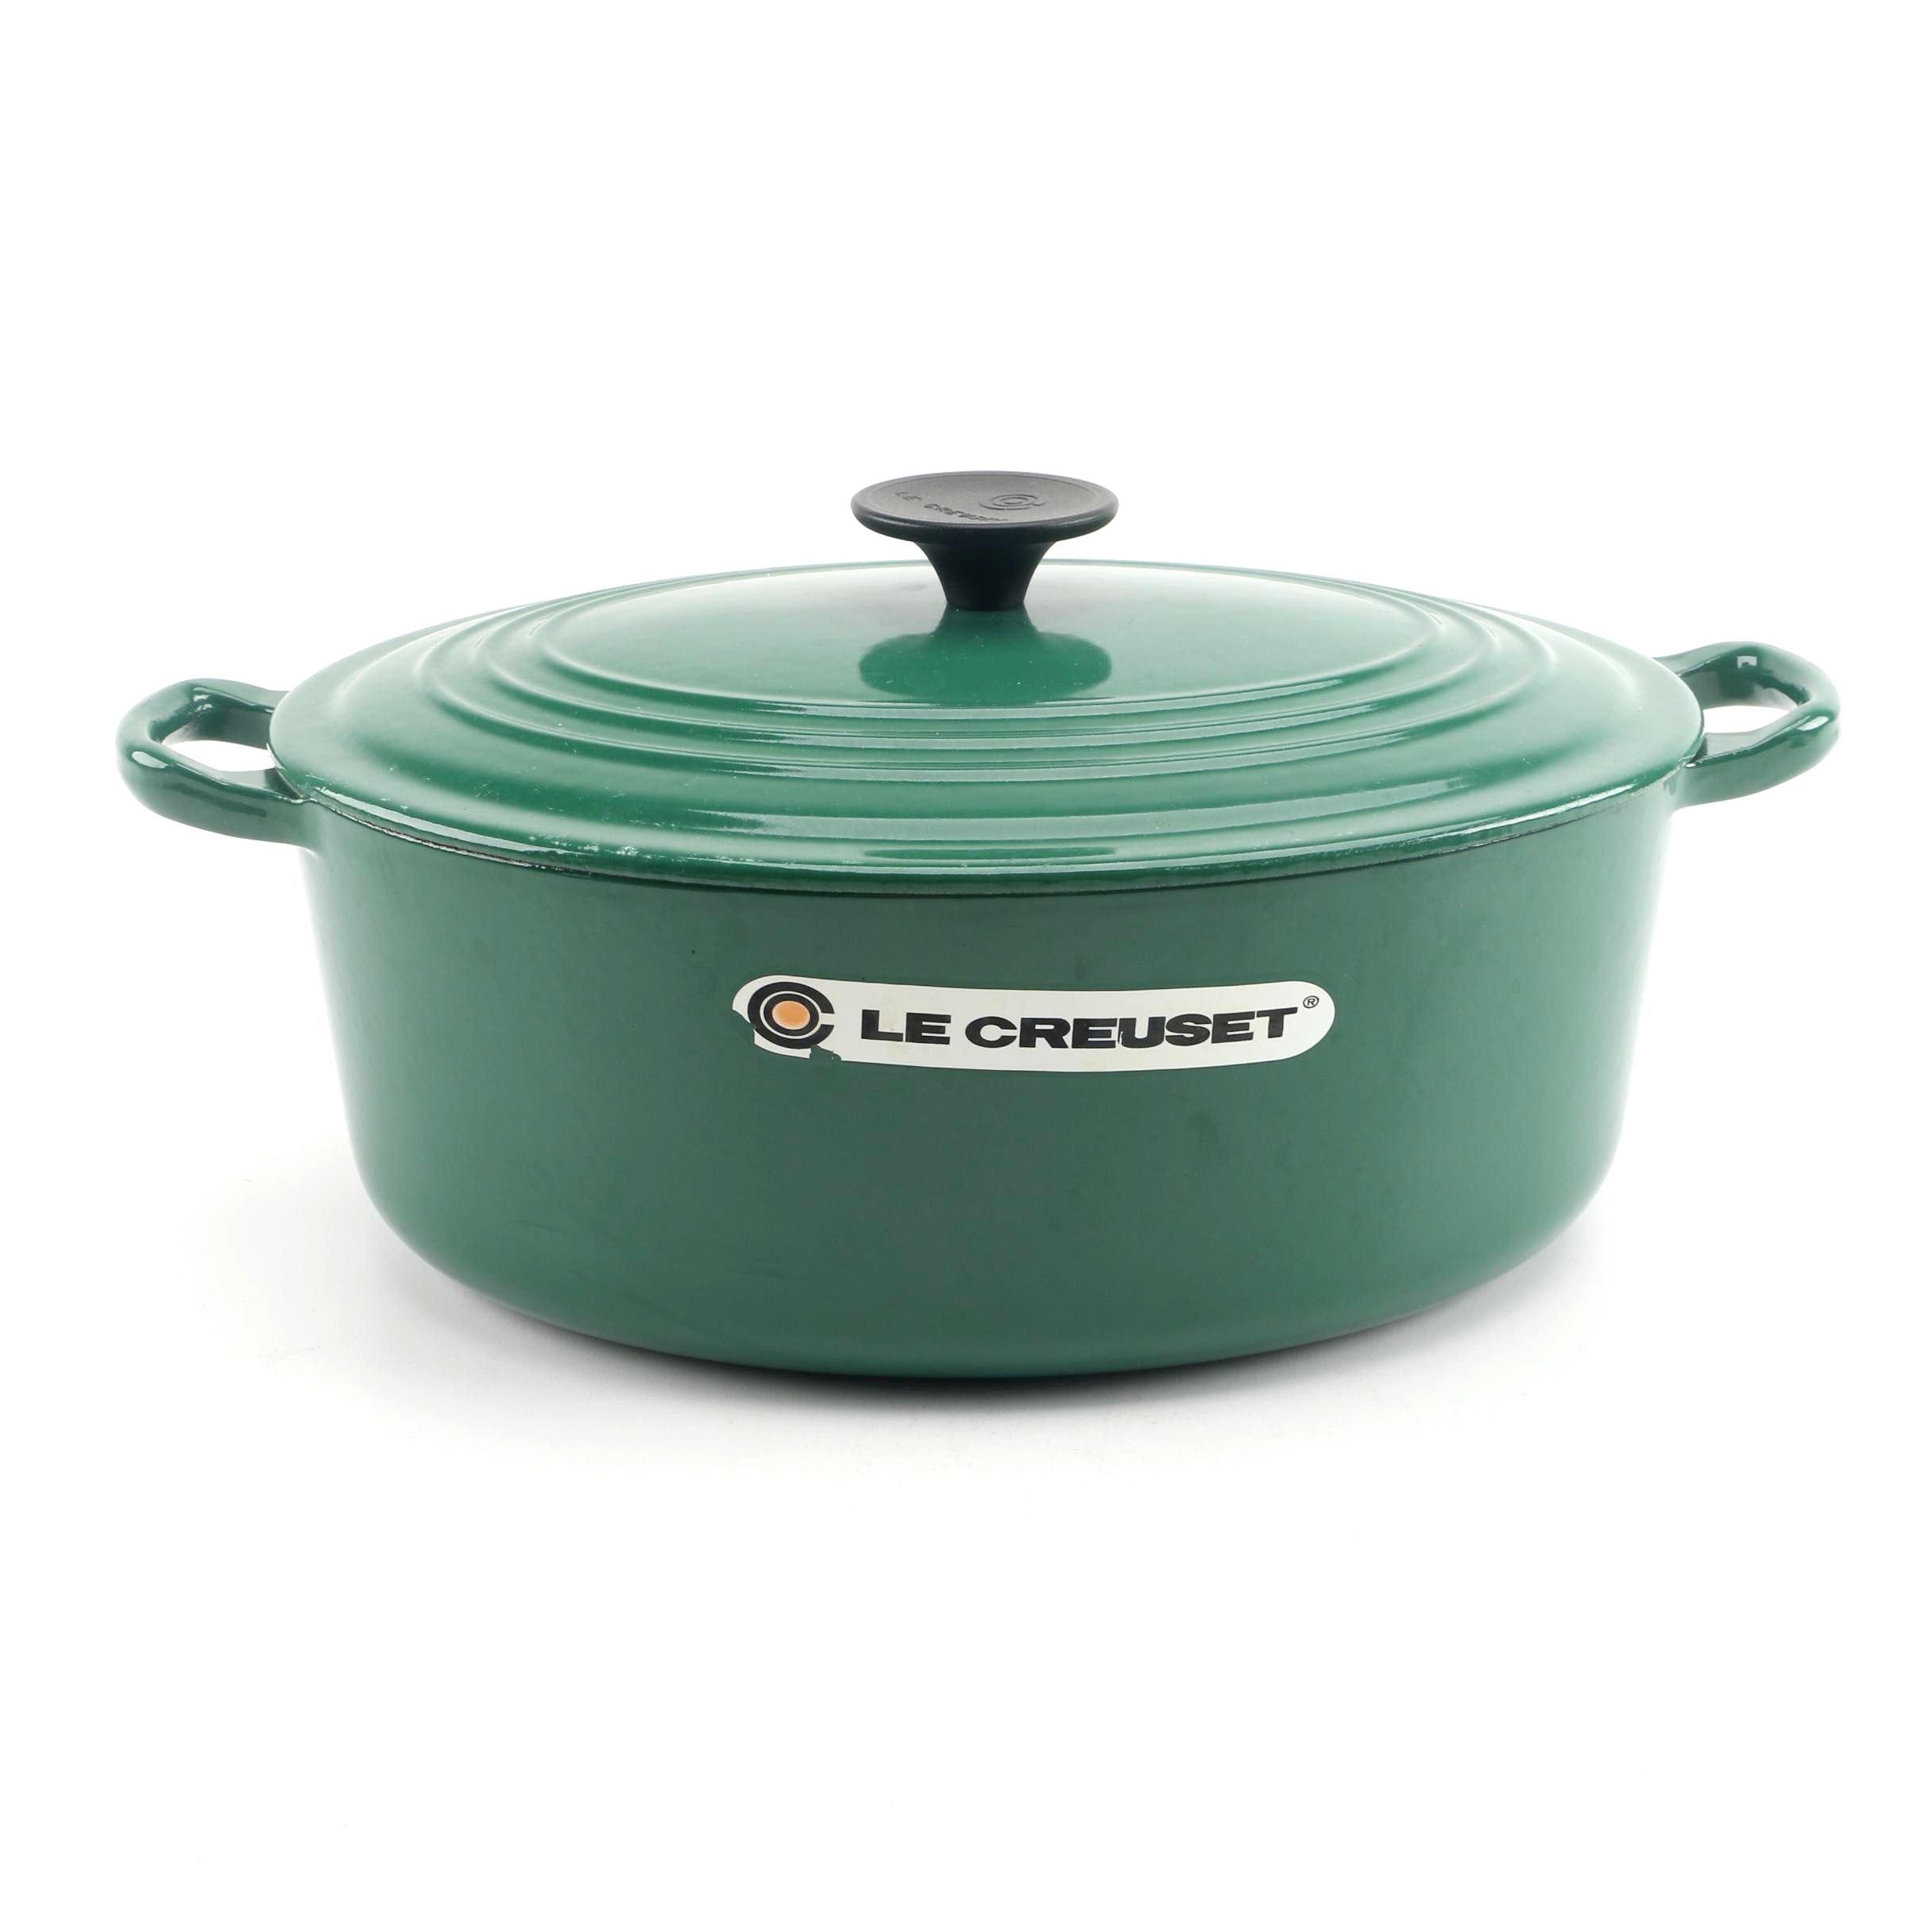 Le Creuset Green Enameled Cast Iron Dutch Oven